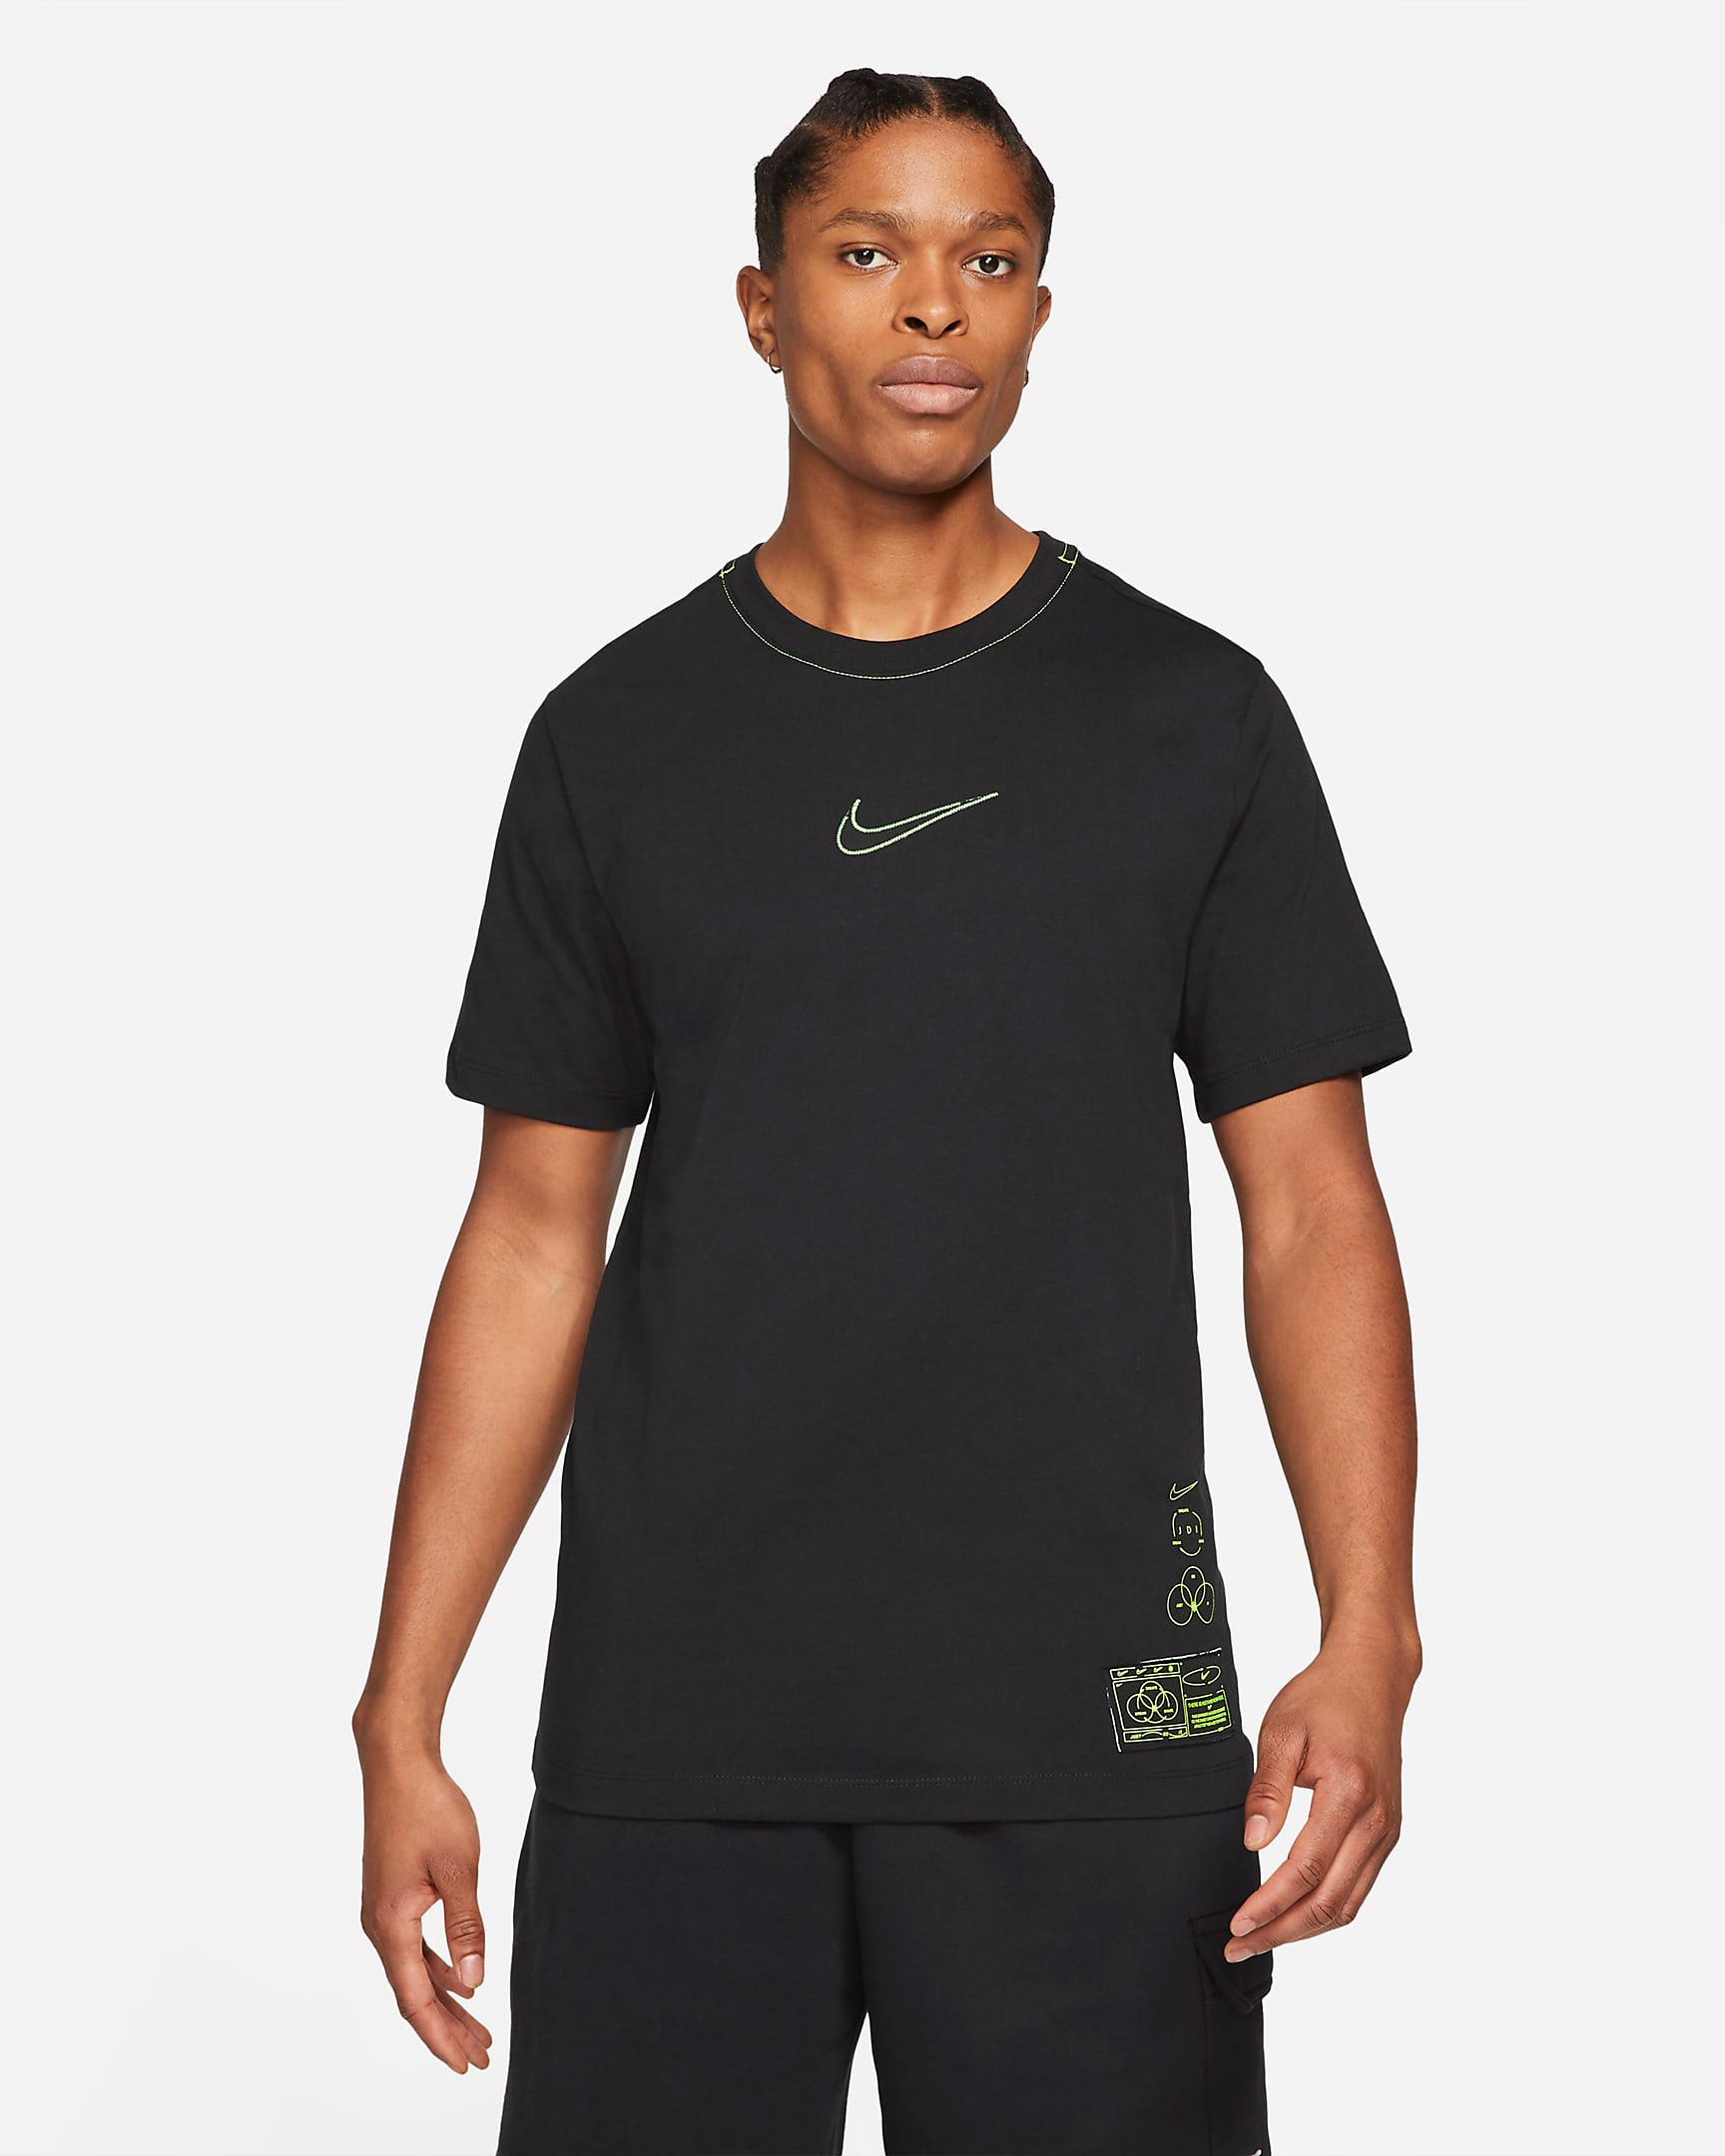 nike-club-t-shirt-black-volt-1